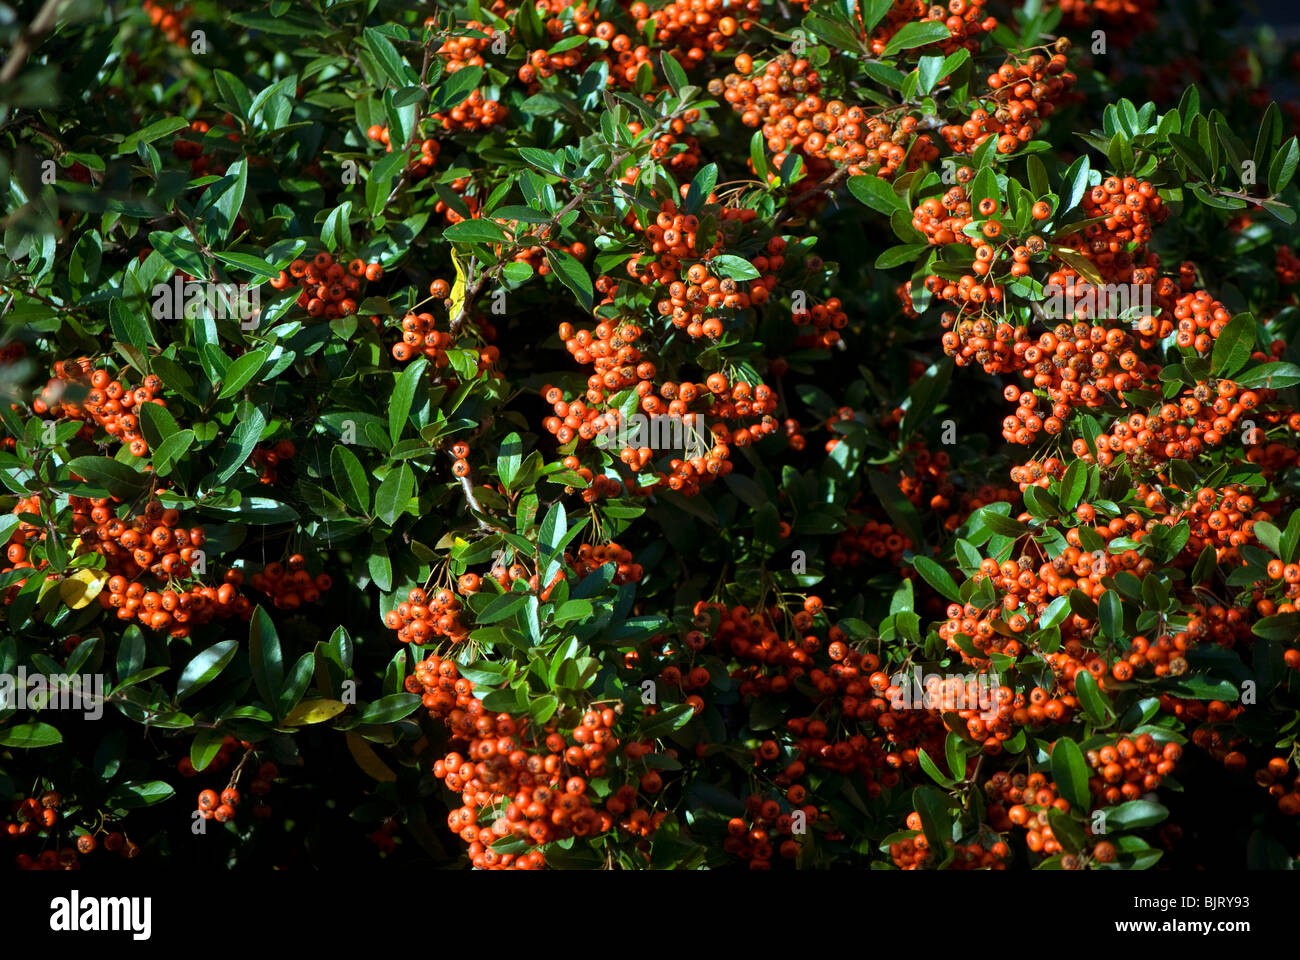 Pyracantha Bush With Orange Berries Stock Photo 28800495 Alamy